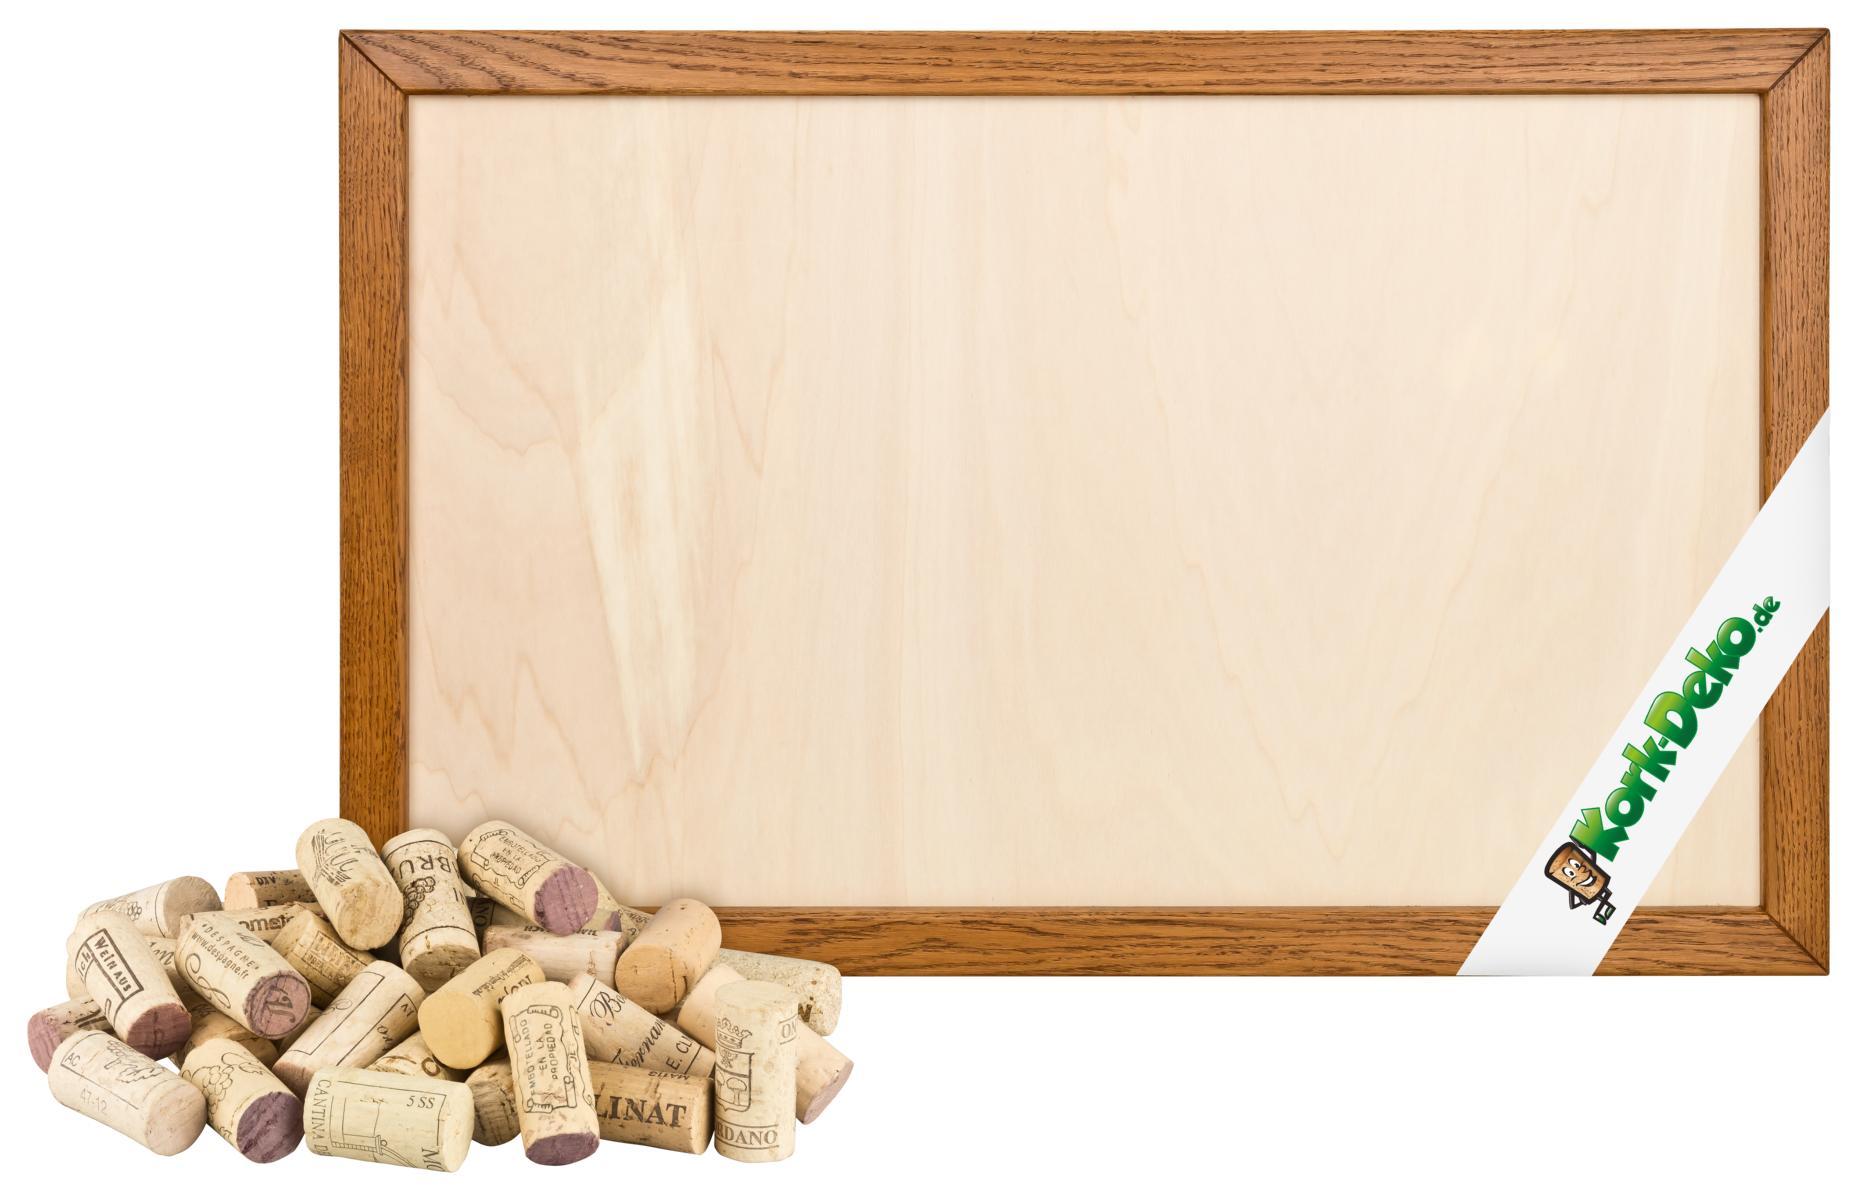 pinnwand aus korken selber bauen alte korken heller. Black Bedroom Furniture Sets. Home Design Ideas